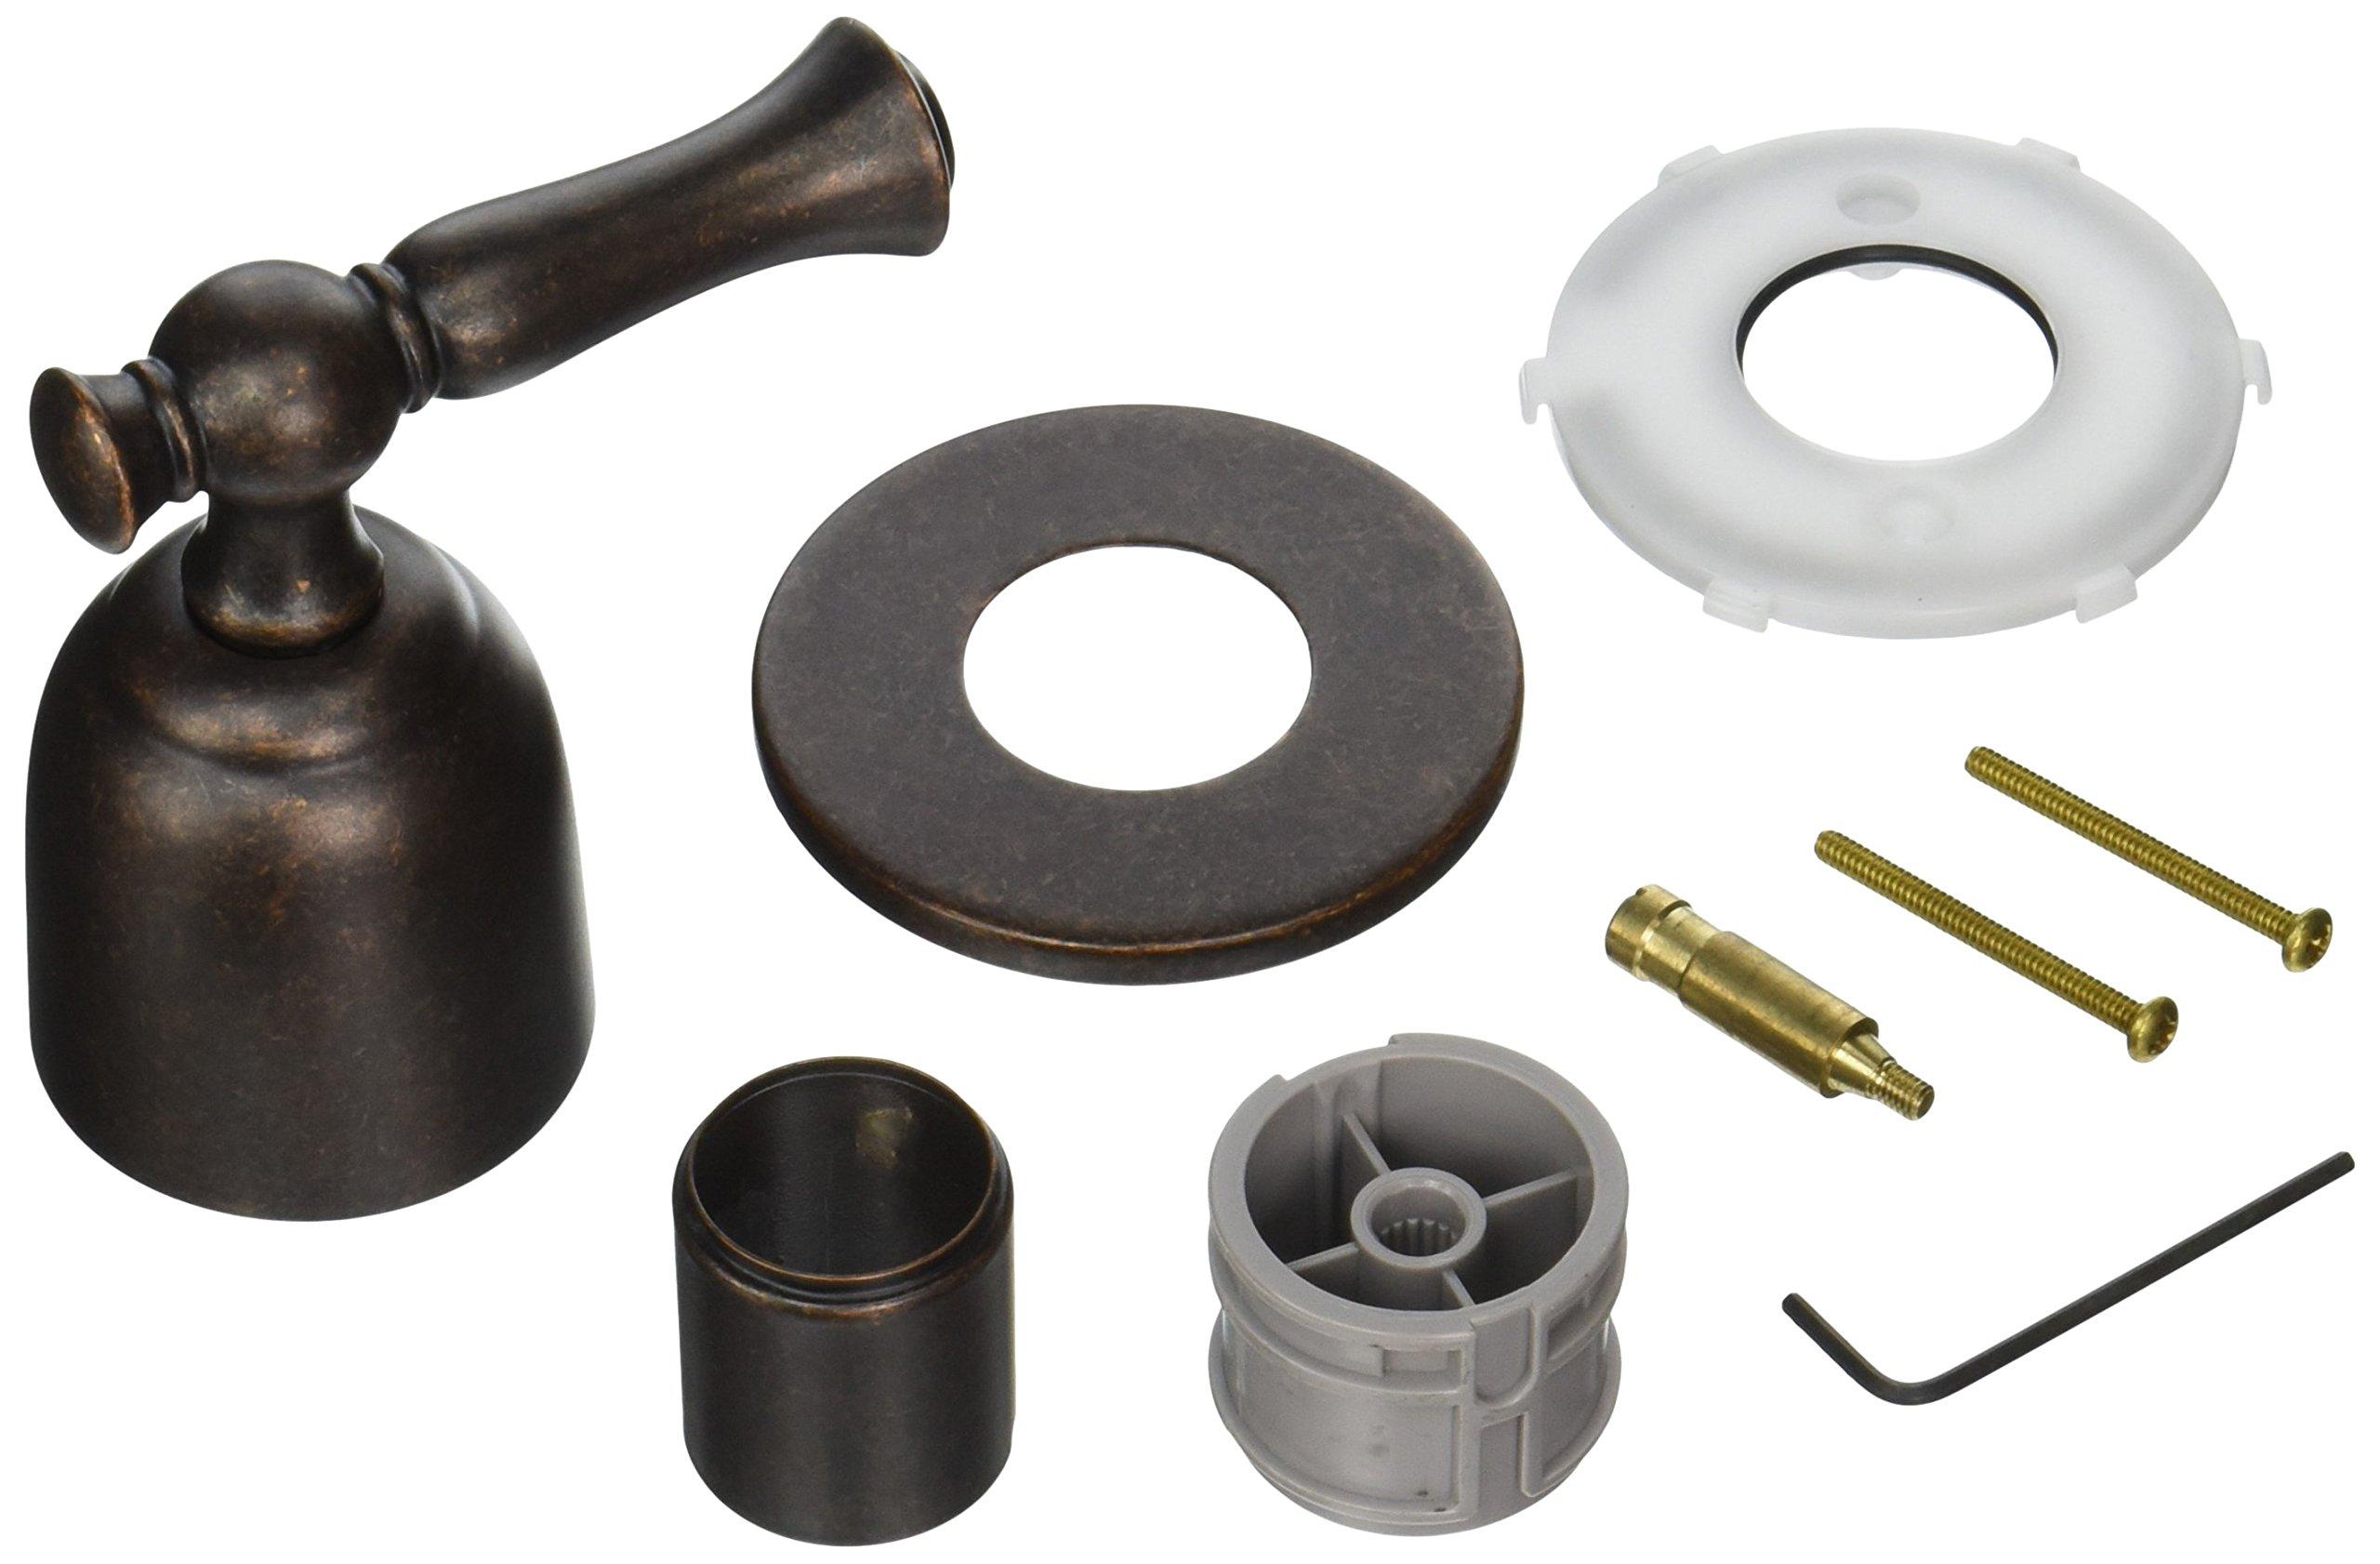 American Standard T440700.224 Quentin Volume Control Trim Kit, Oil Rubbed Bronze